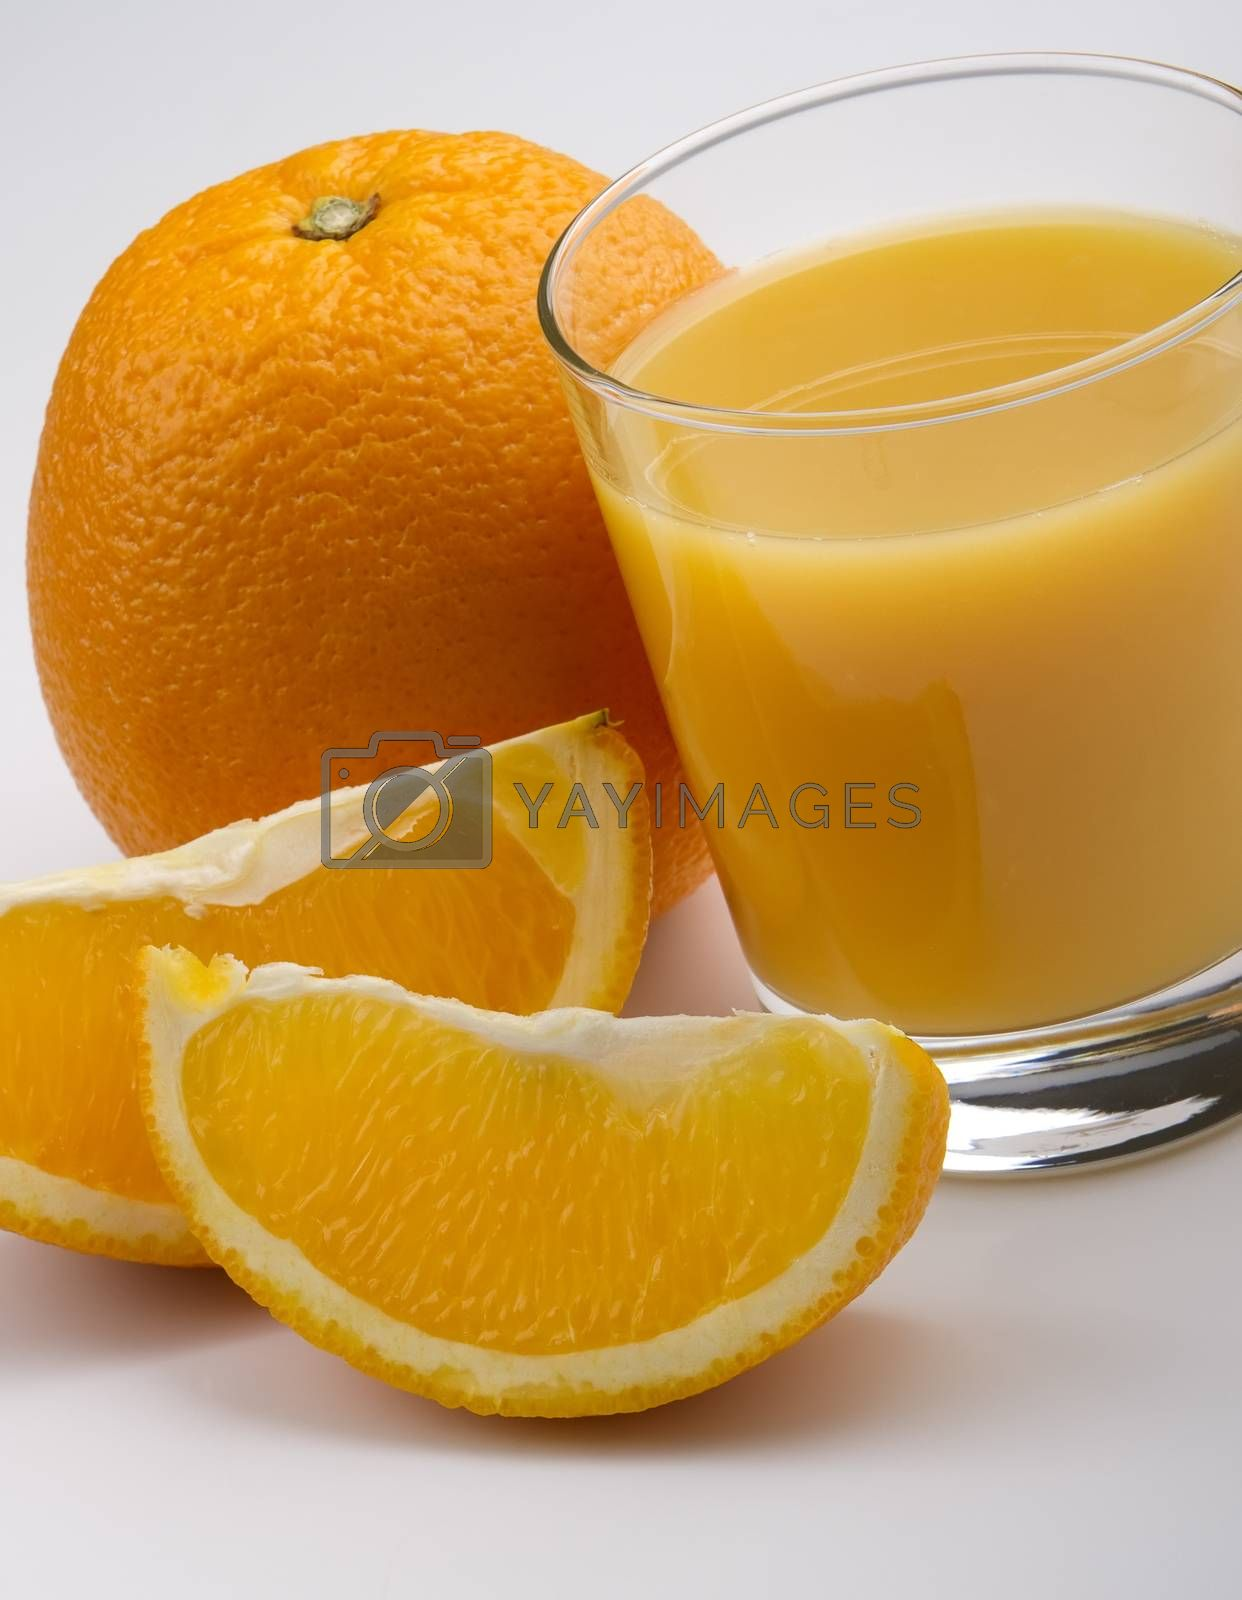 Royalty free image of orange juice by phortcach